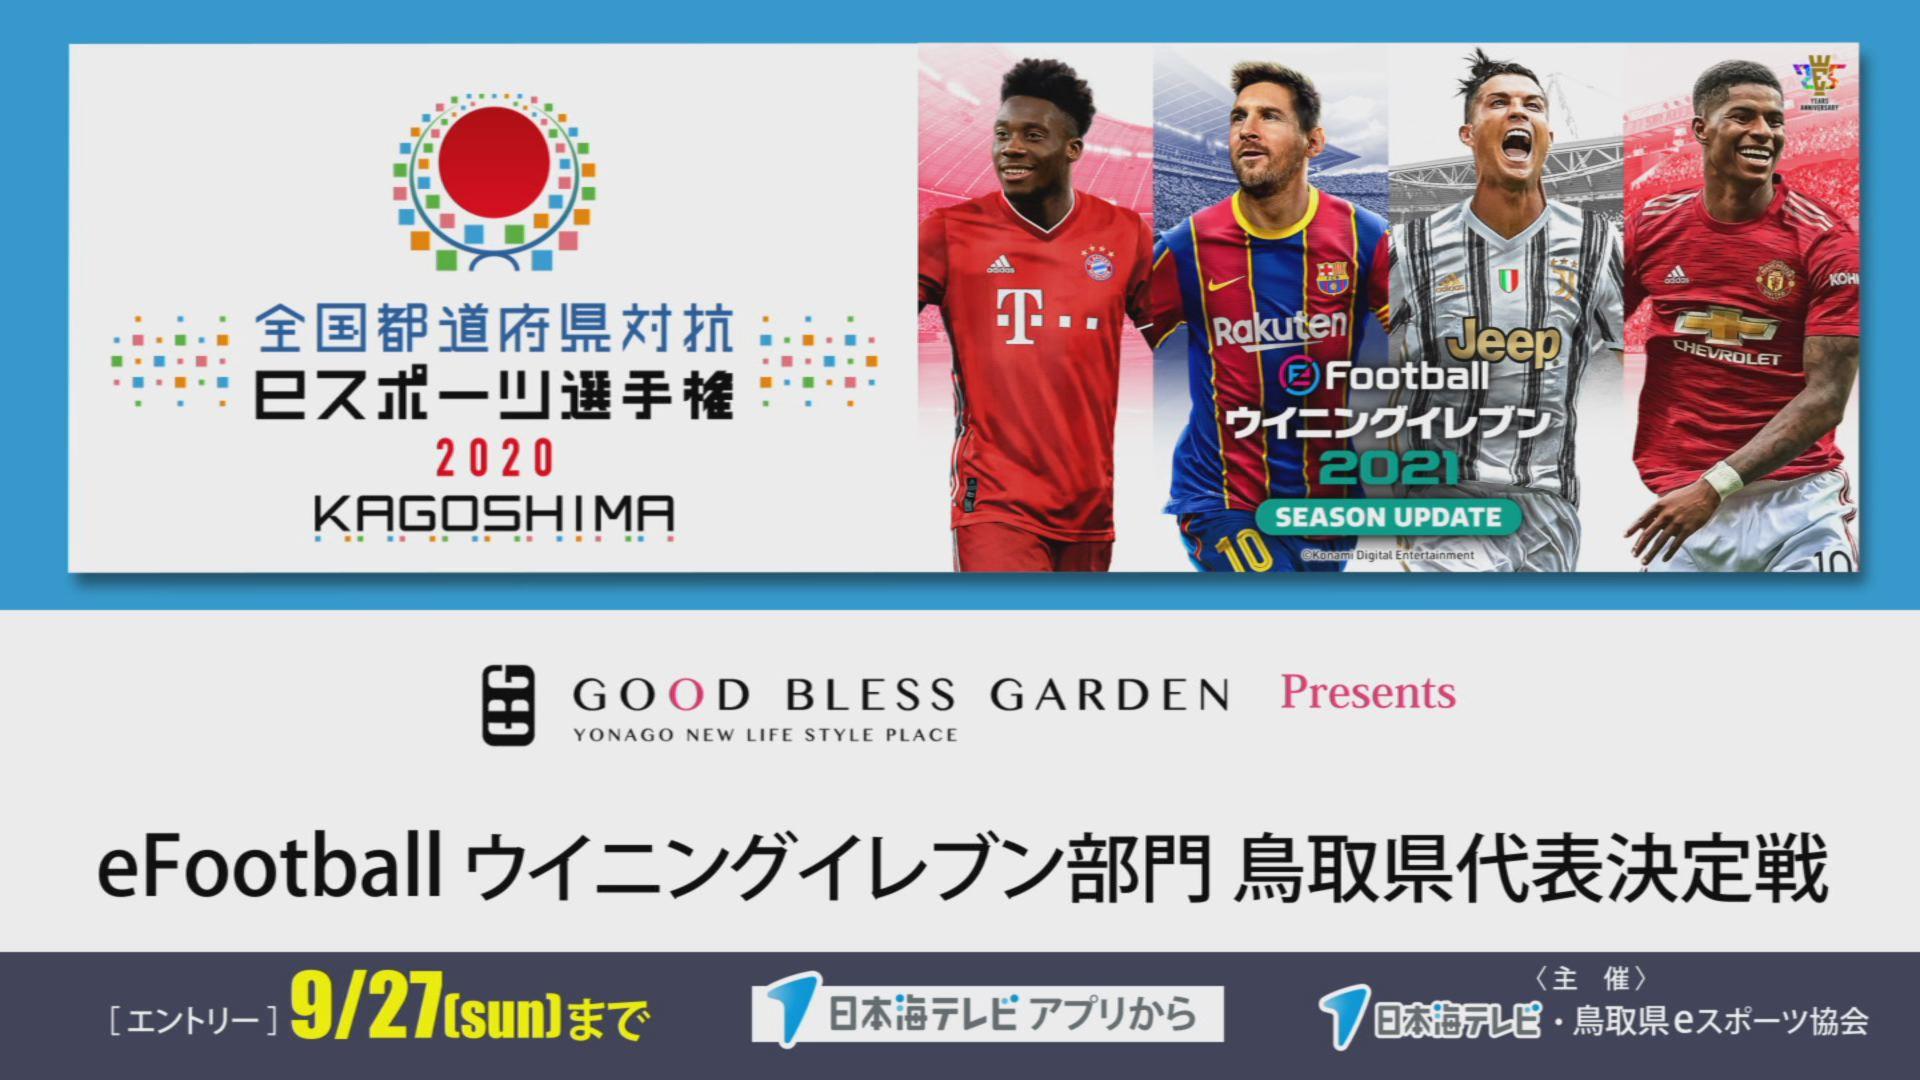 eFootballウイニングイレブン部門 鳥取県代表決定戦開催!